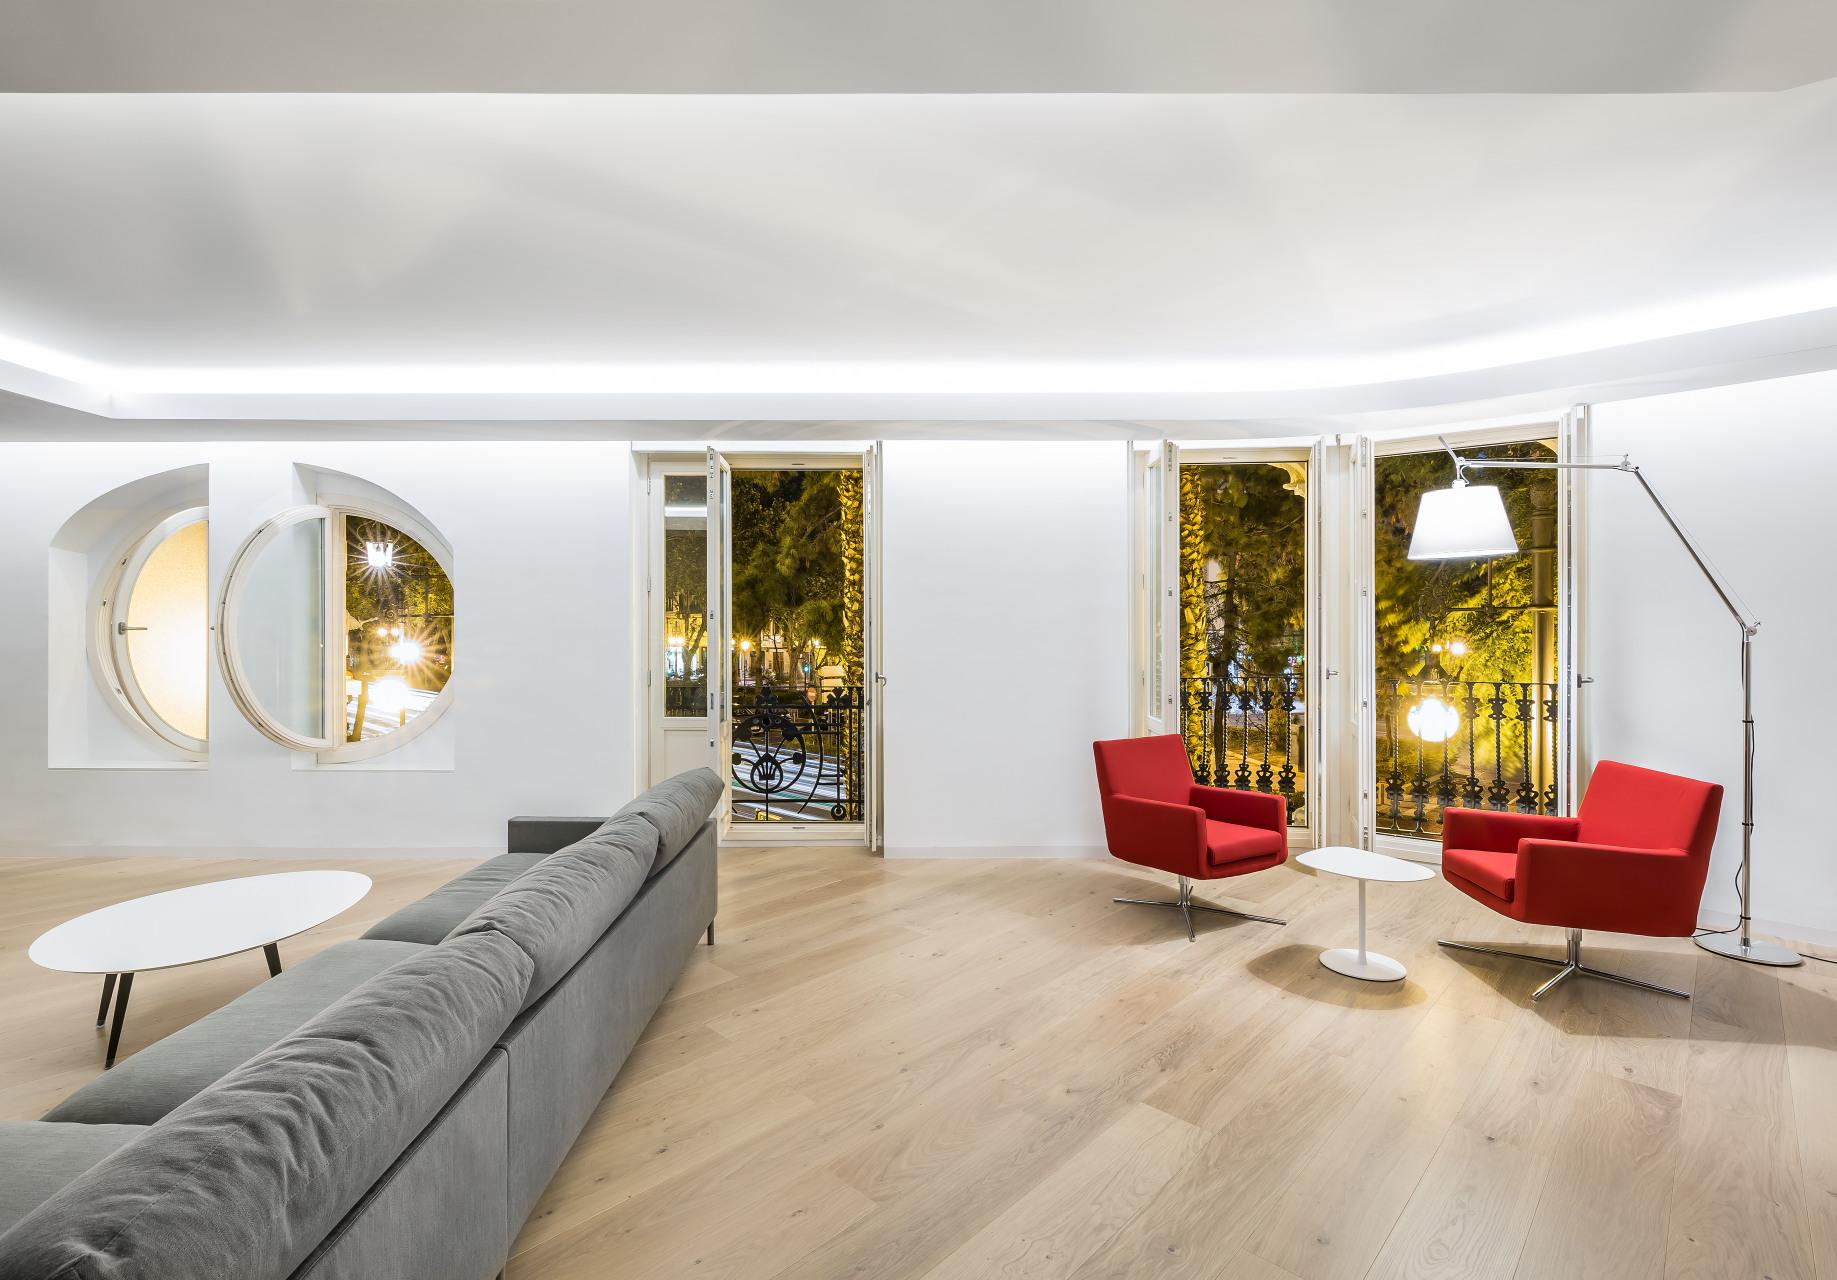 fotografia-arquitectura-interiorismo-valencia-german-cabo-gallardo-llopis-bfm-edificatoria-turia02 (20)